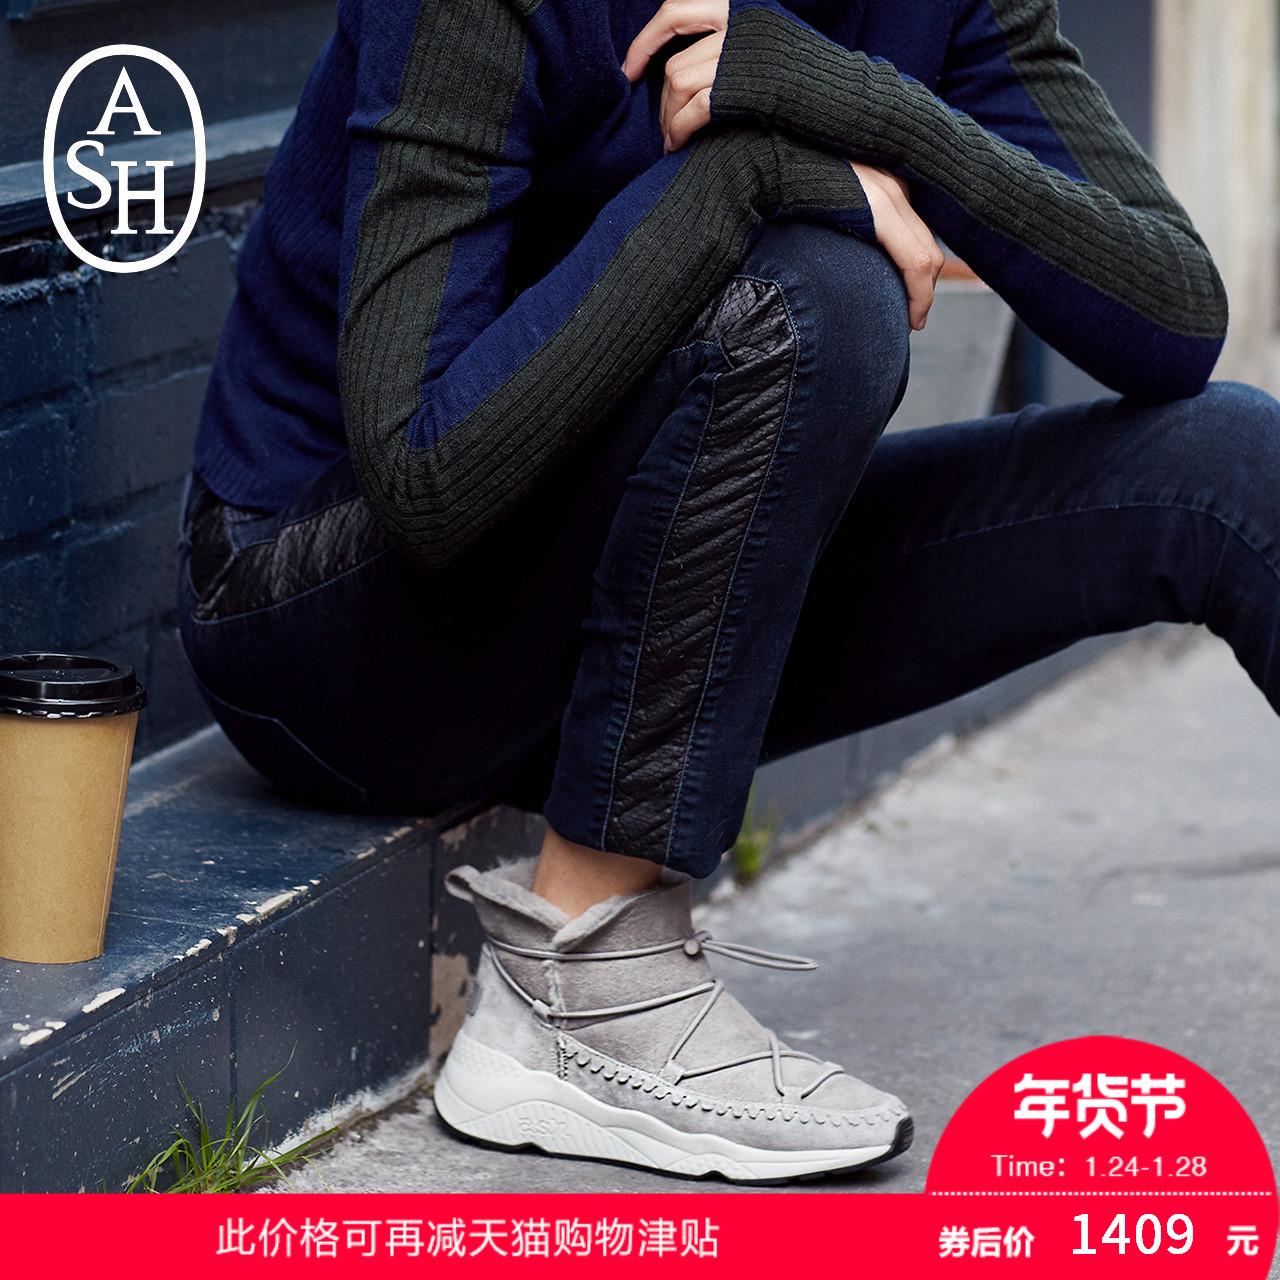 ASH女鞋2017秋季新款MITSOUKO运动底休闲短筒绑带雪地靴女